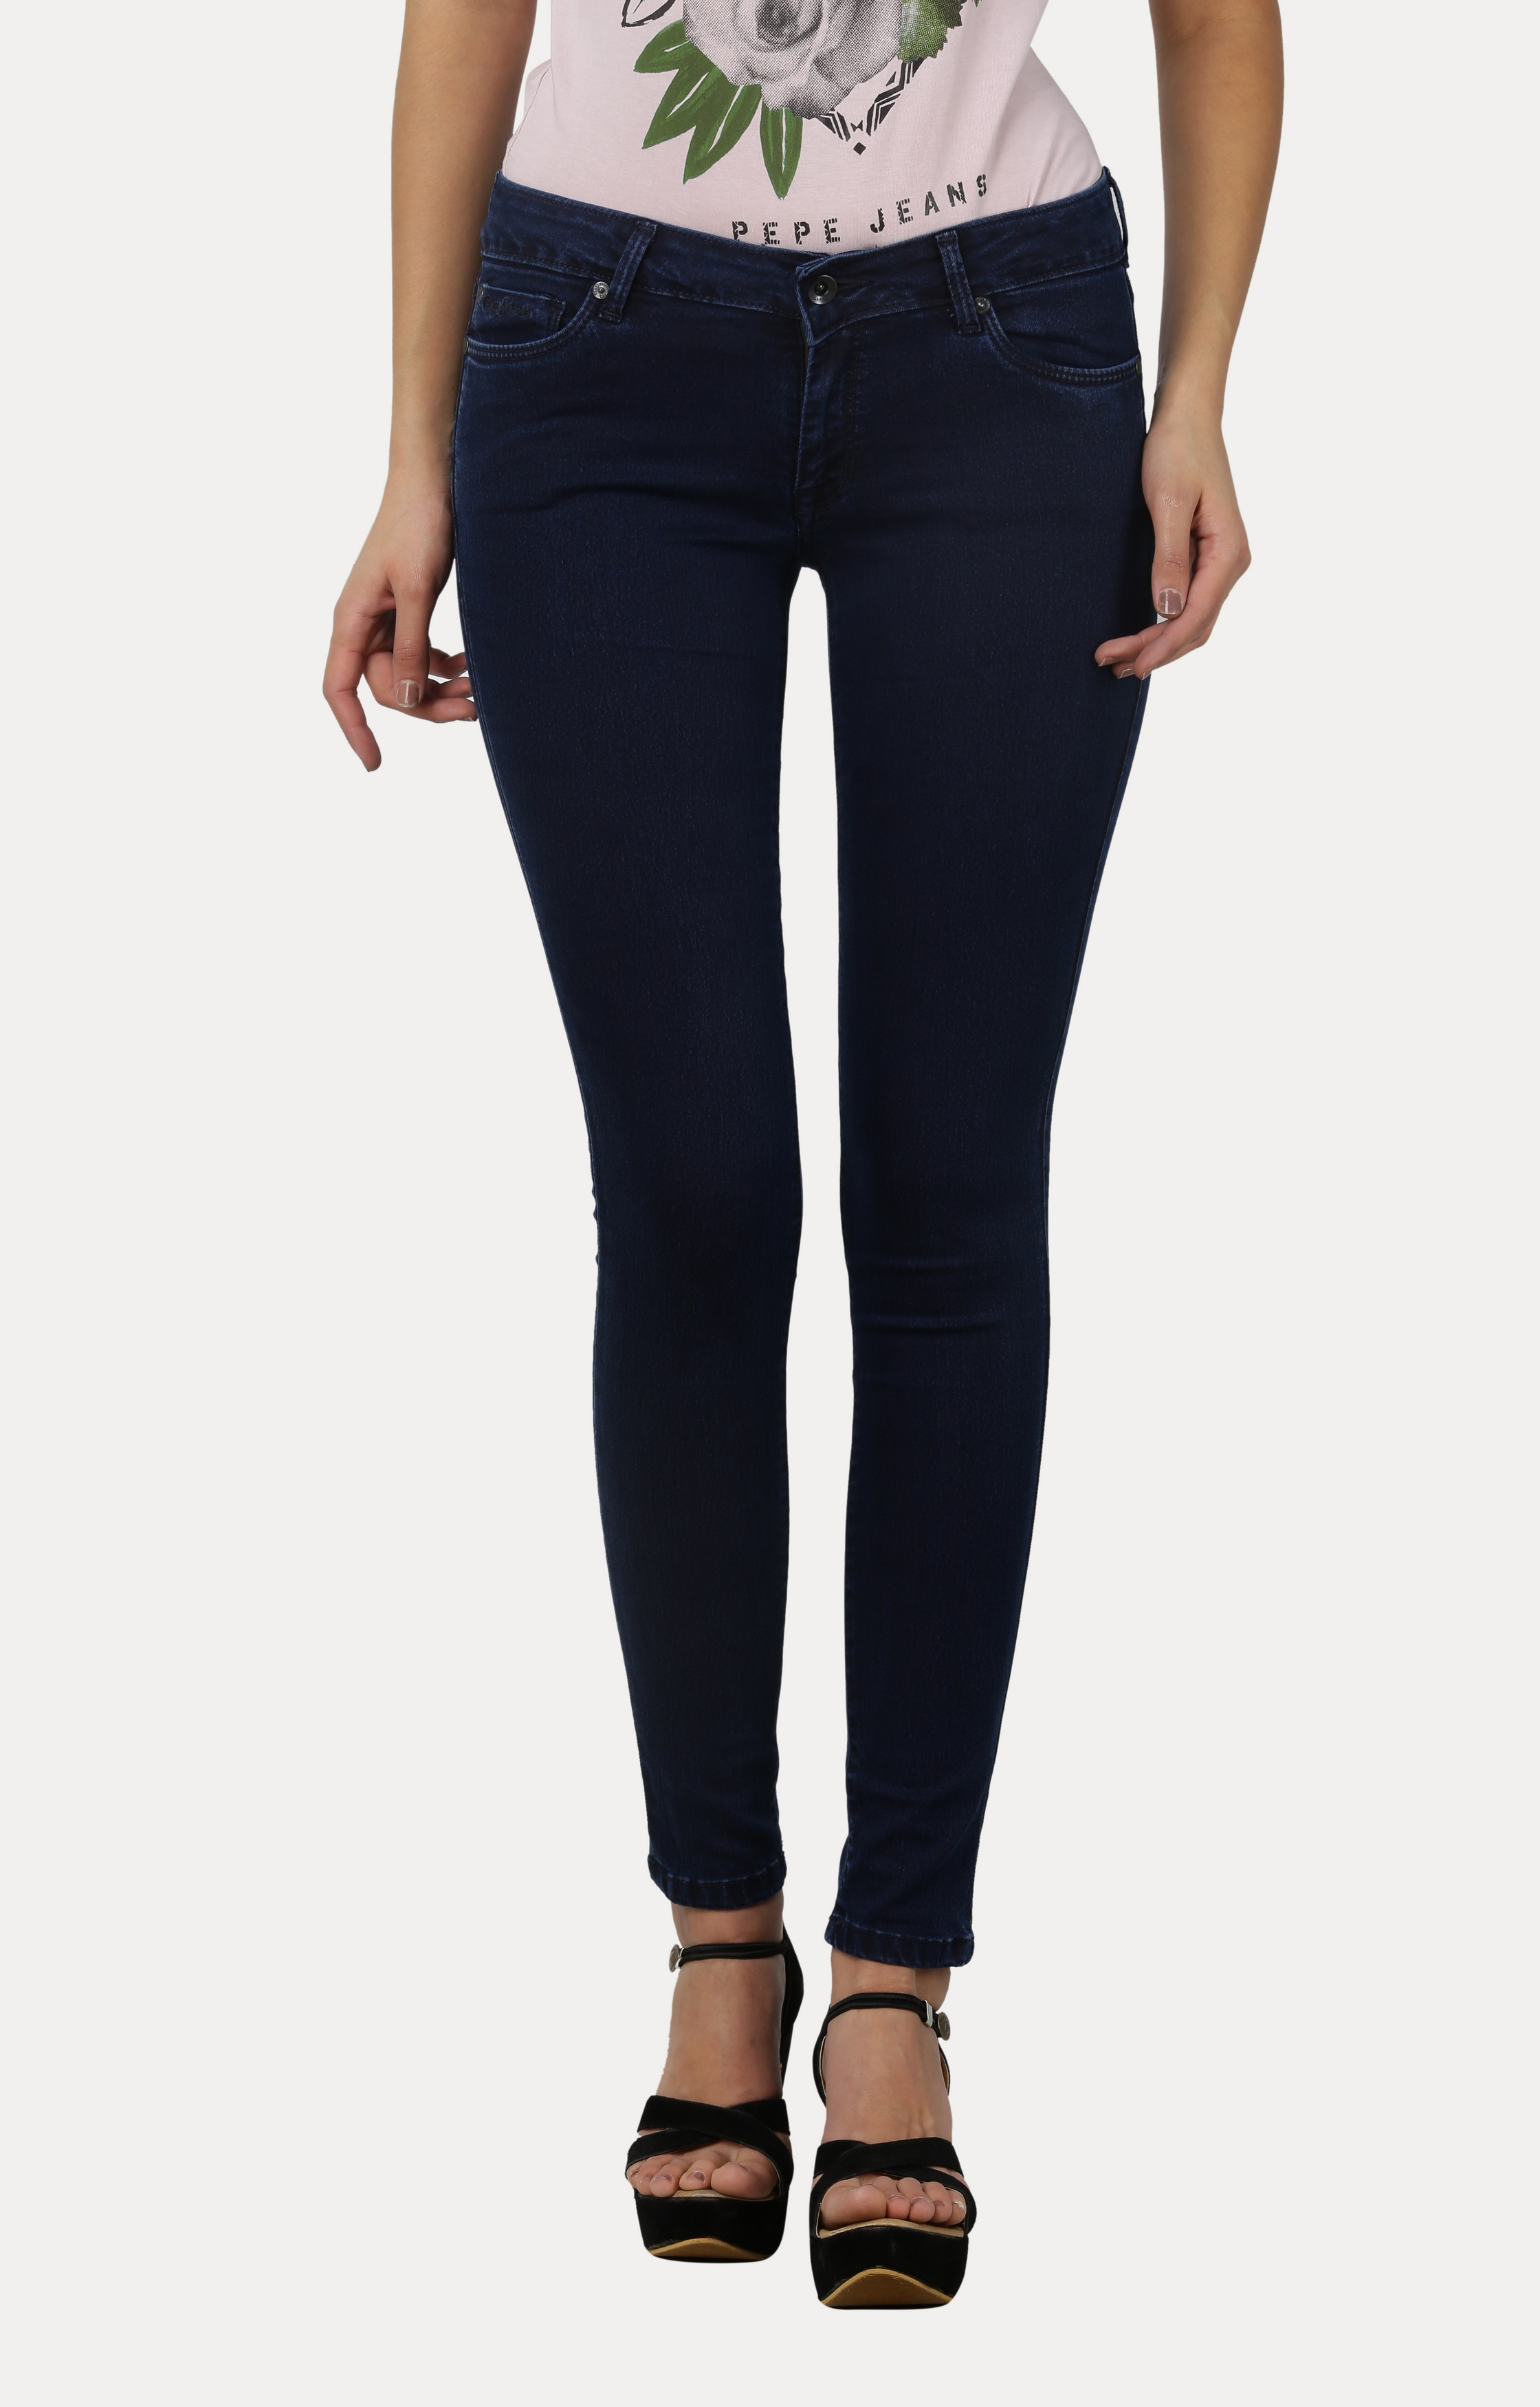 Pepe Jeans | LOLA.3_ANT-BLUE